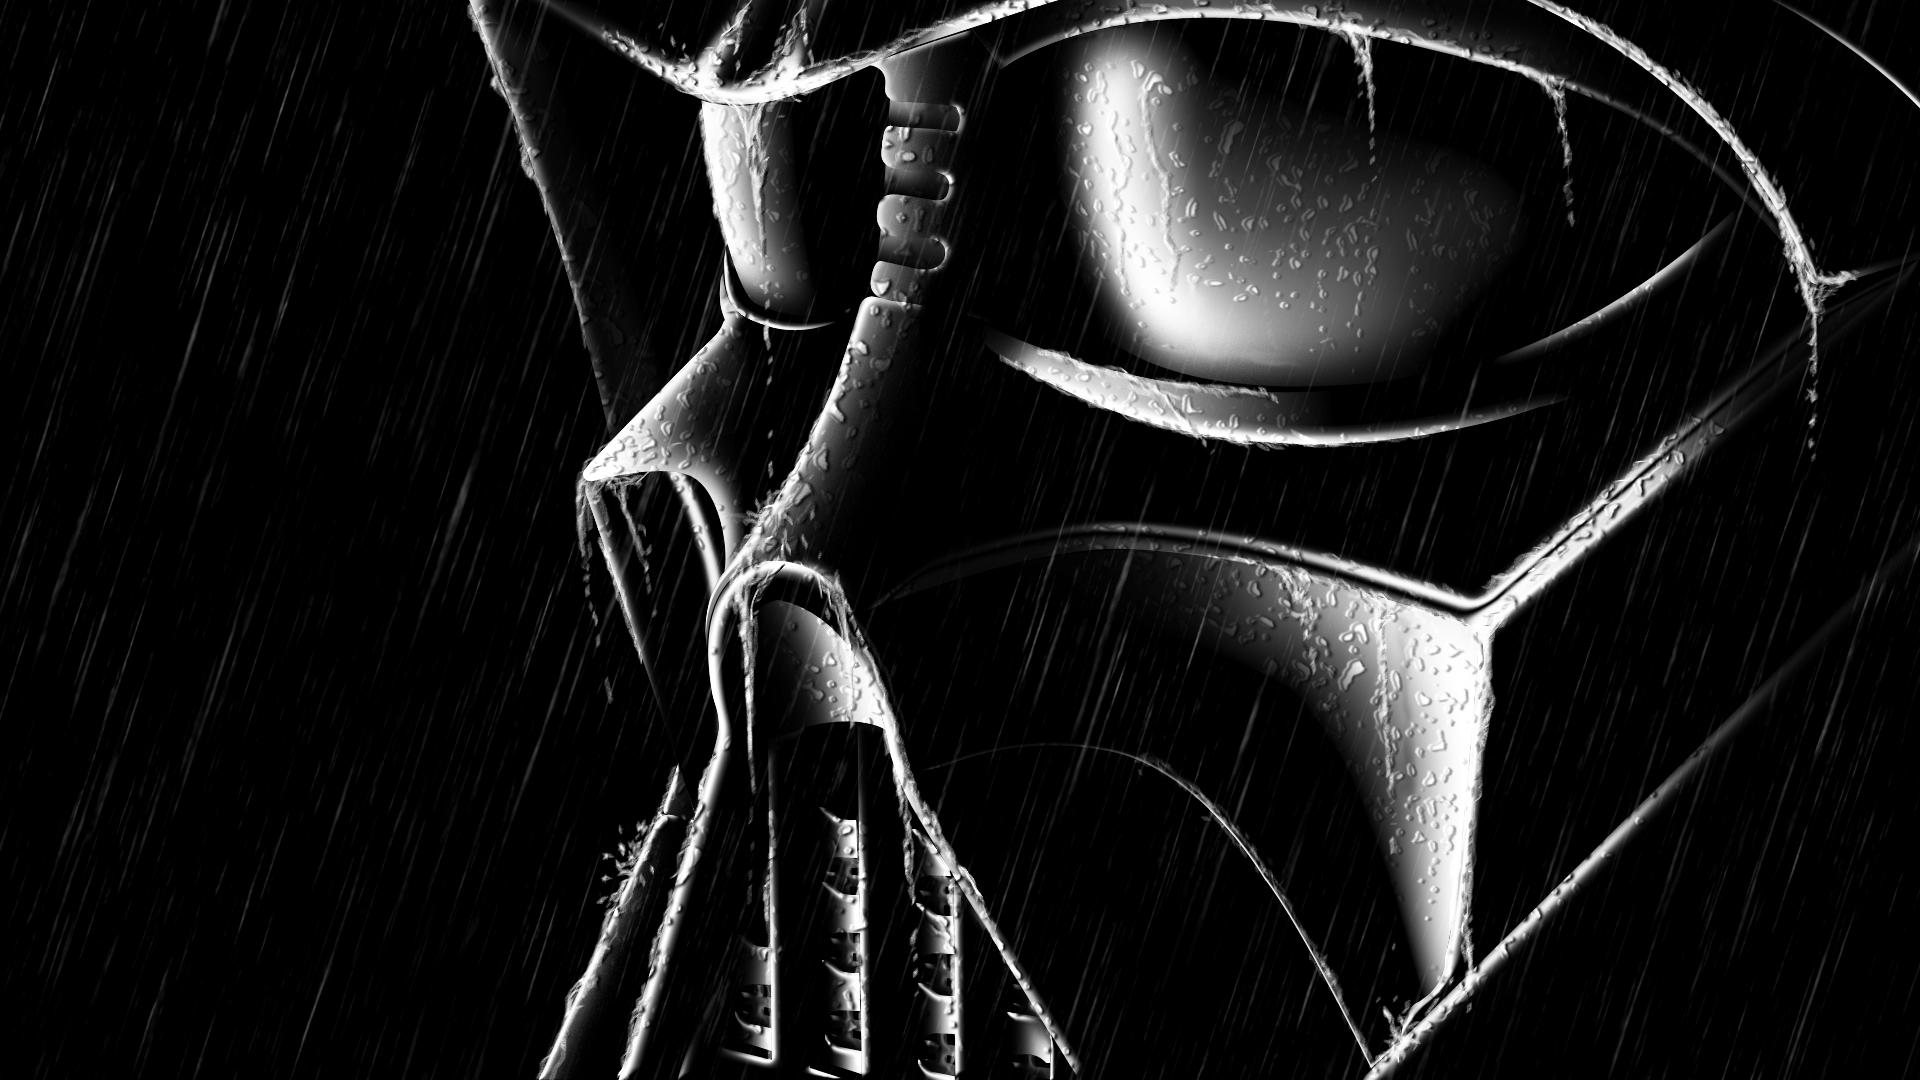 Darth - Darth Vader , HD Wallpaper & Backgrounds